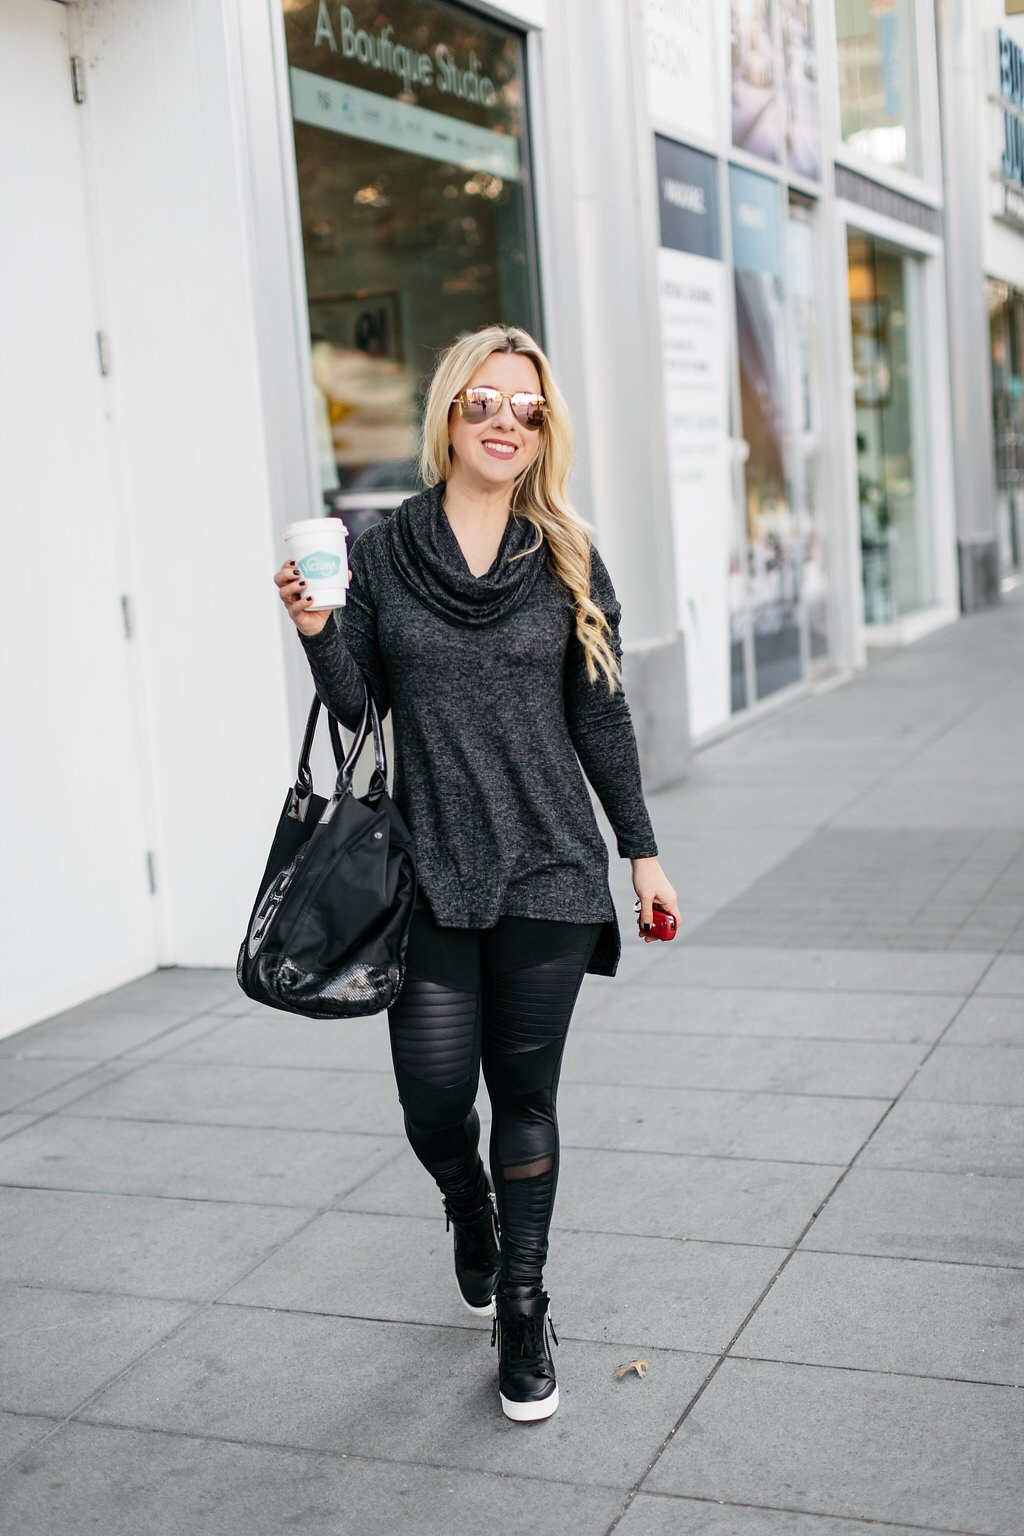 Athleisure | The Darling Petite Diva | Nicole Kirk